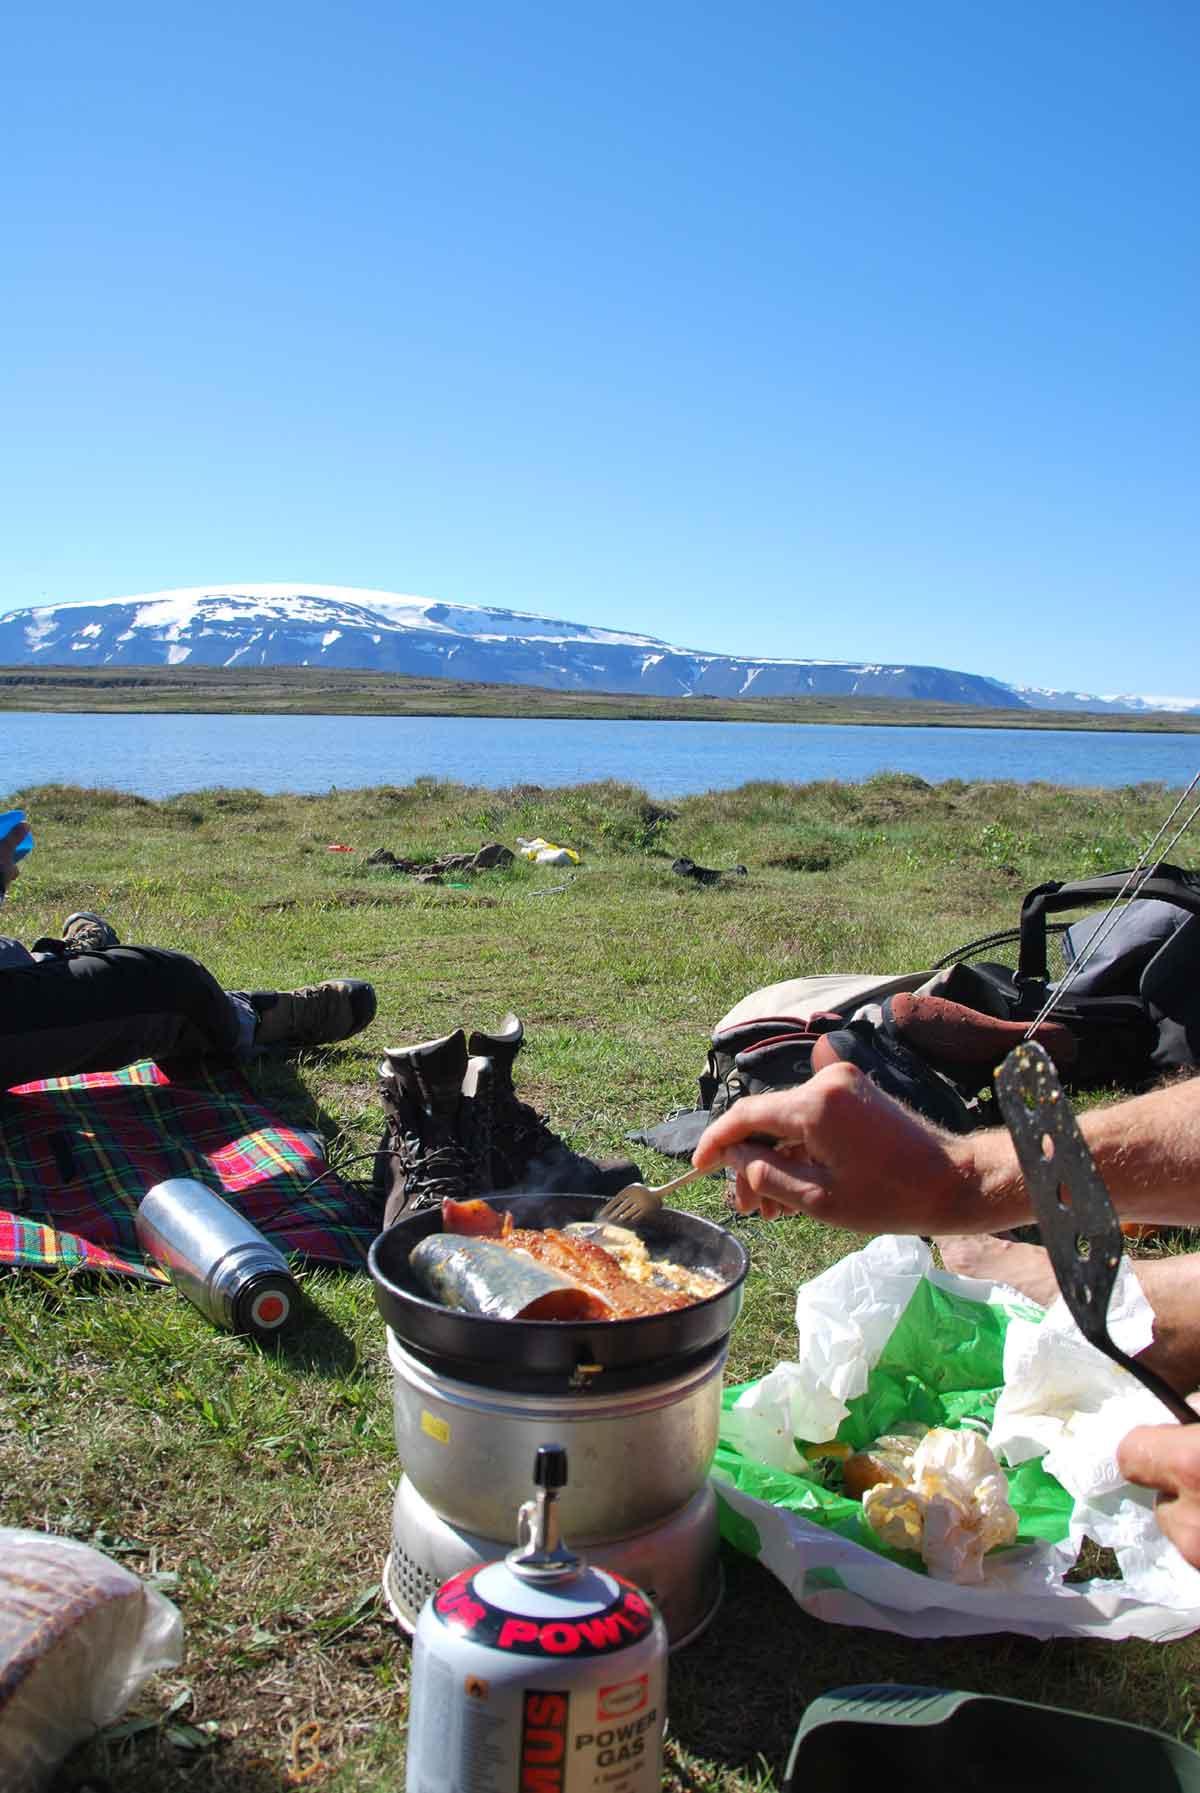 Arnarvatnsheidi - Fishing Tours Iceland - gofishing.is